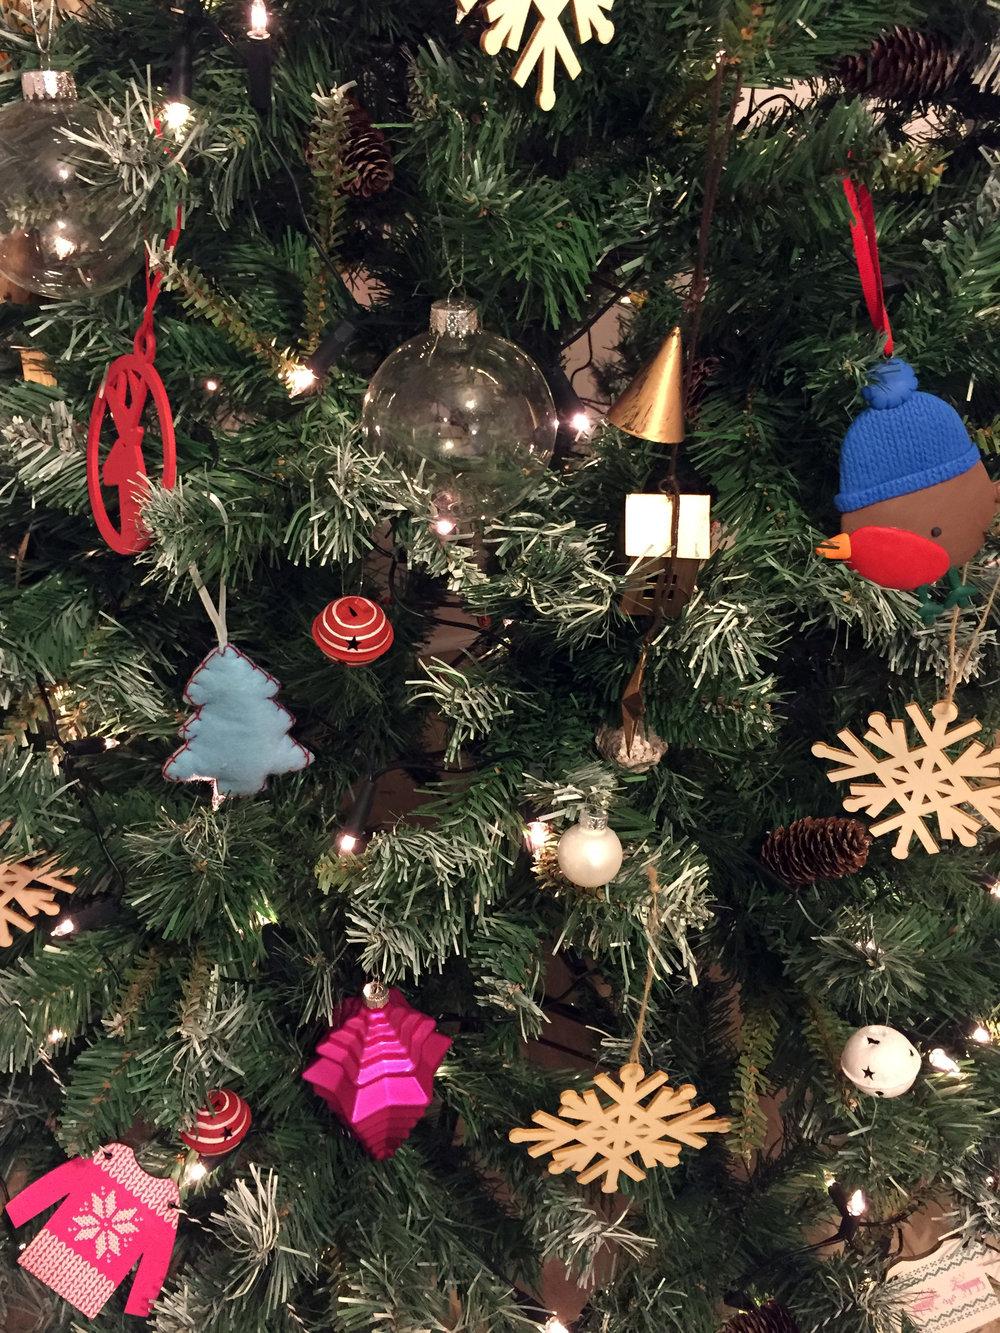 Christmas ways to help